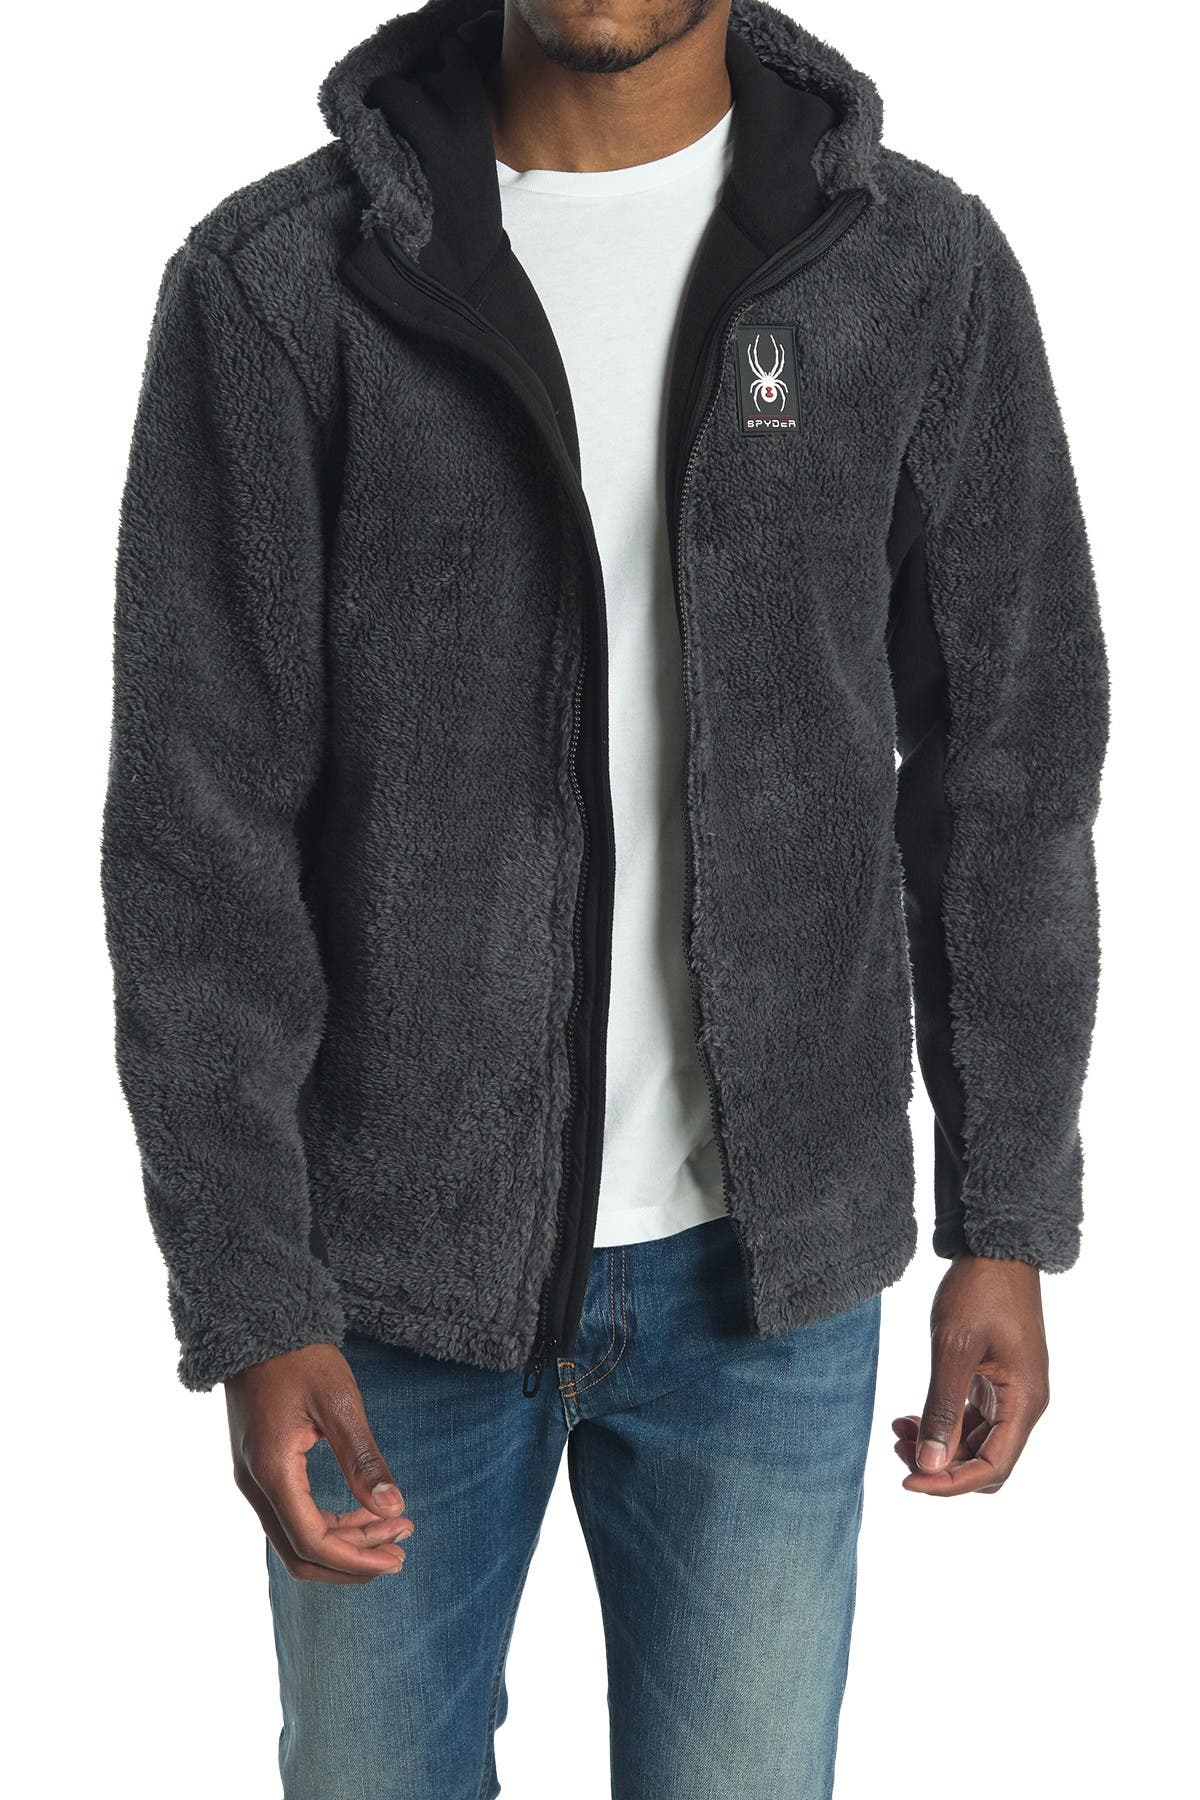 Image of SPYDER Shaggy Full Zip Jacket